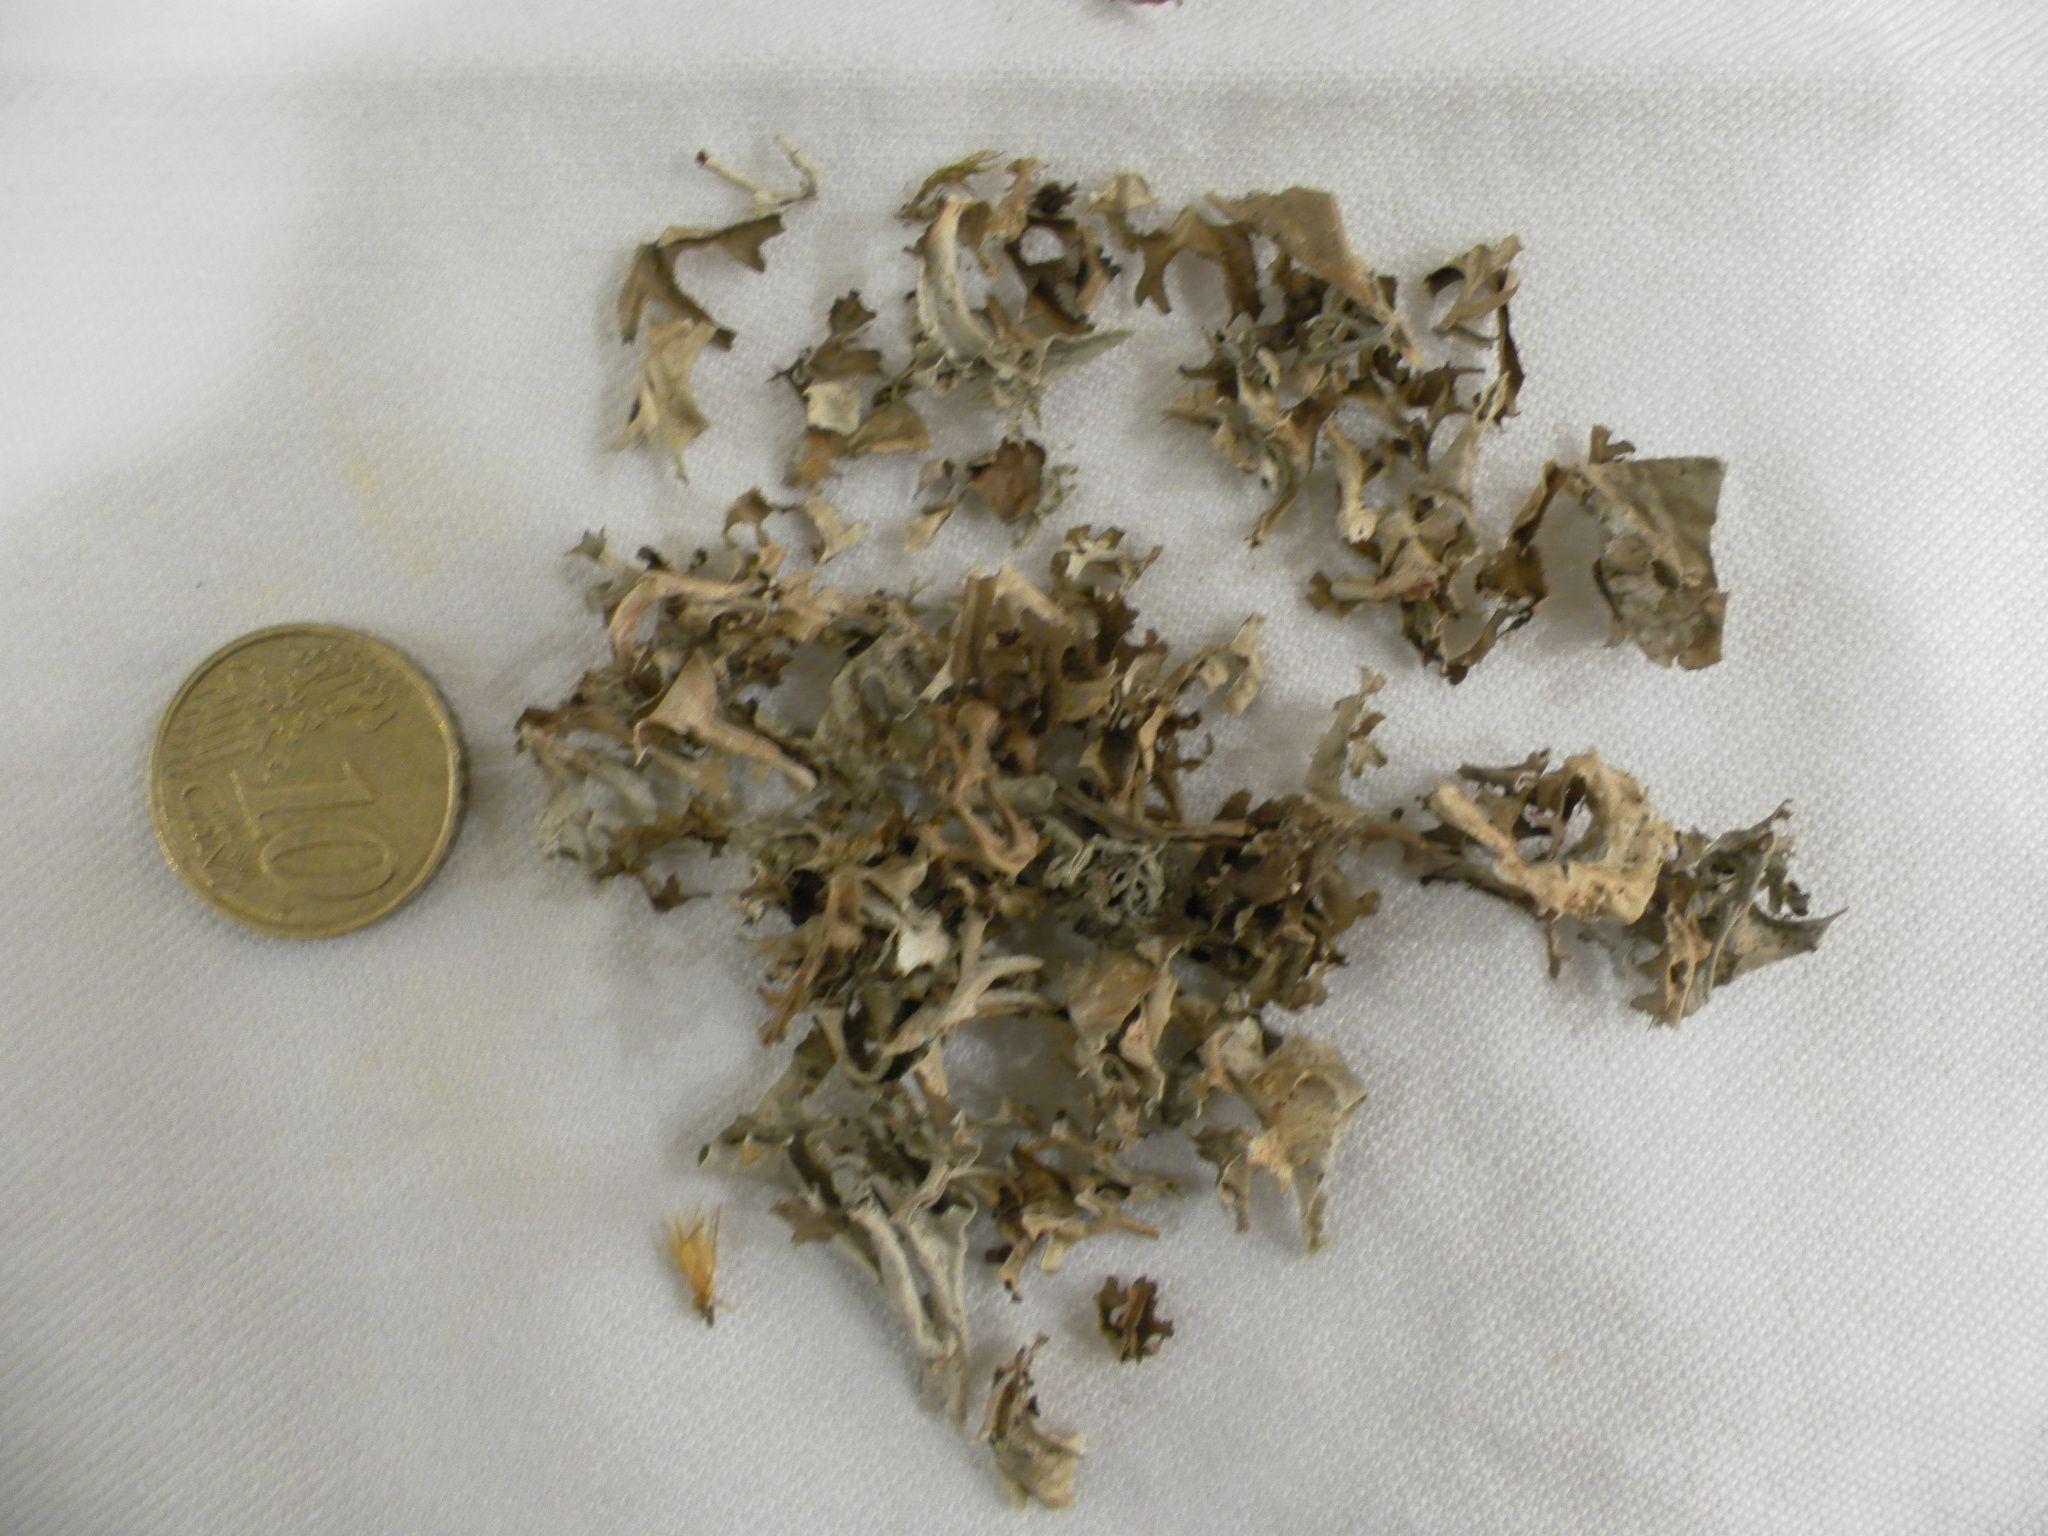 Lichen d'Islande, Cetraria islandica, PARMELIACEES, plante entière, immunostimulan, antibiotique ...